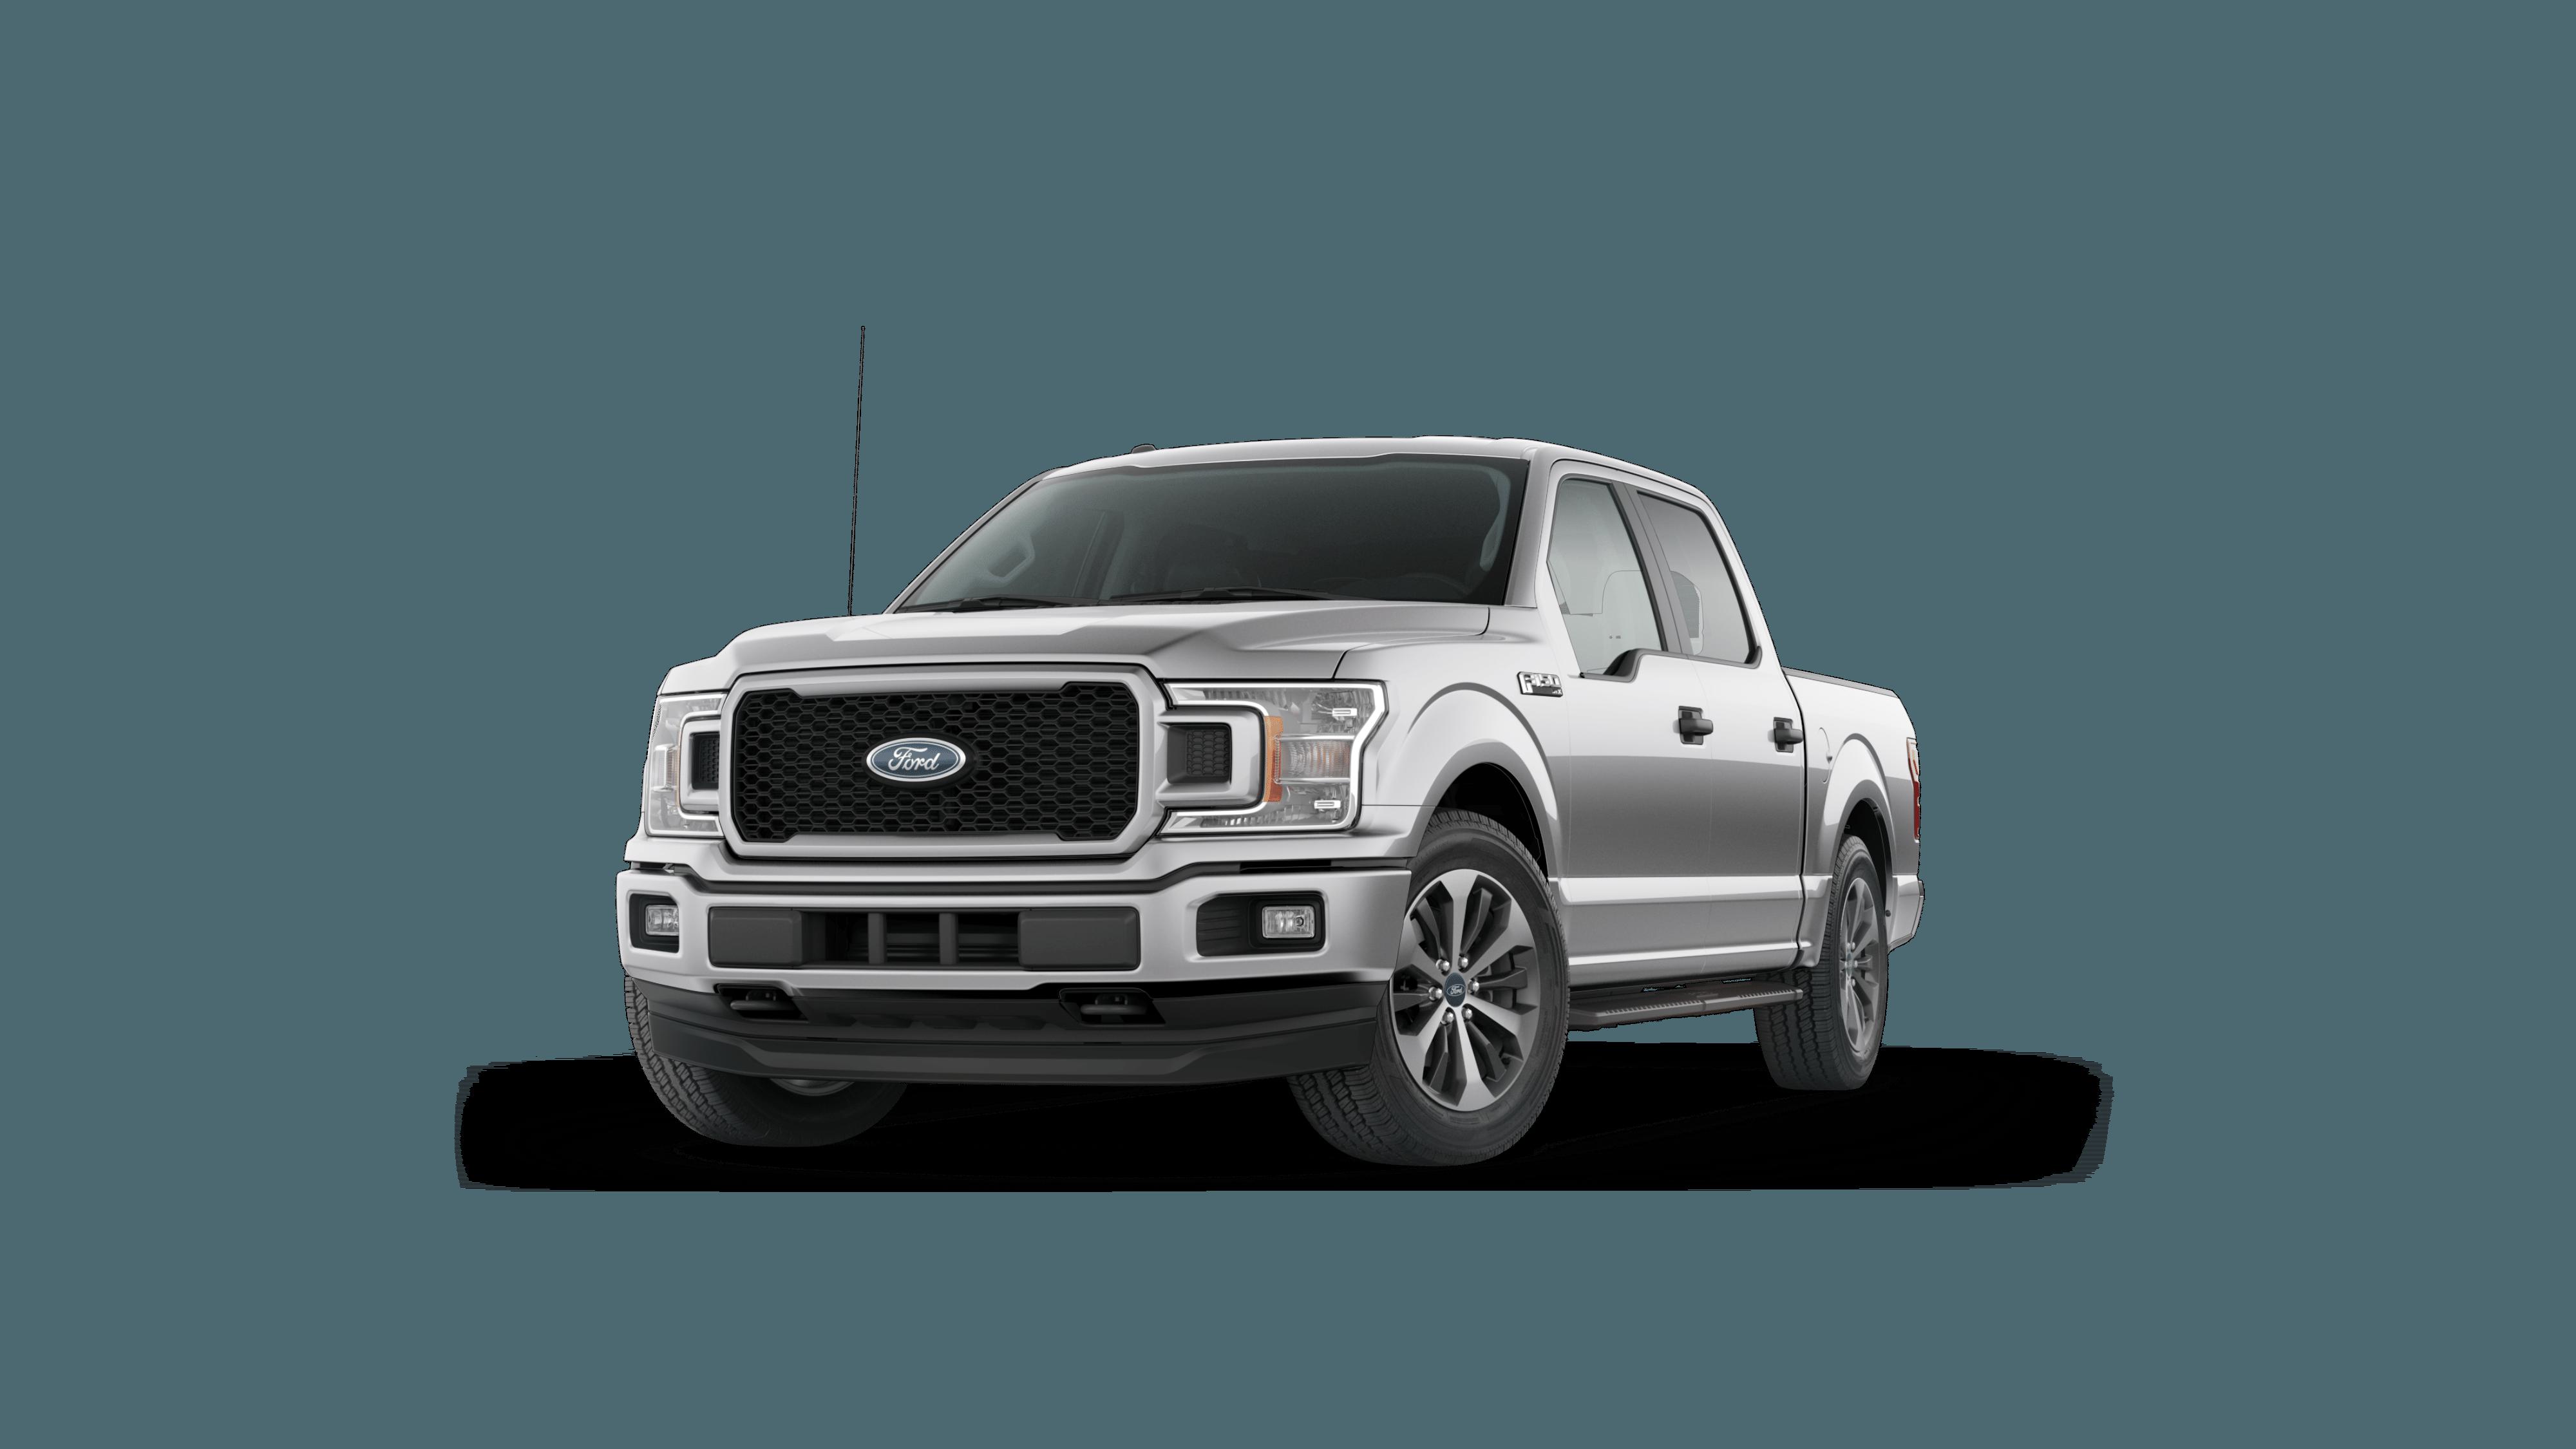 Ciocca Ford Quakertown >> New 2019 Ford F-150 XL 4WD SuperCrew 5.5' Box For Sale in Quakertown, PA   KFA50019